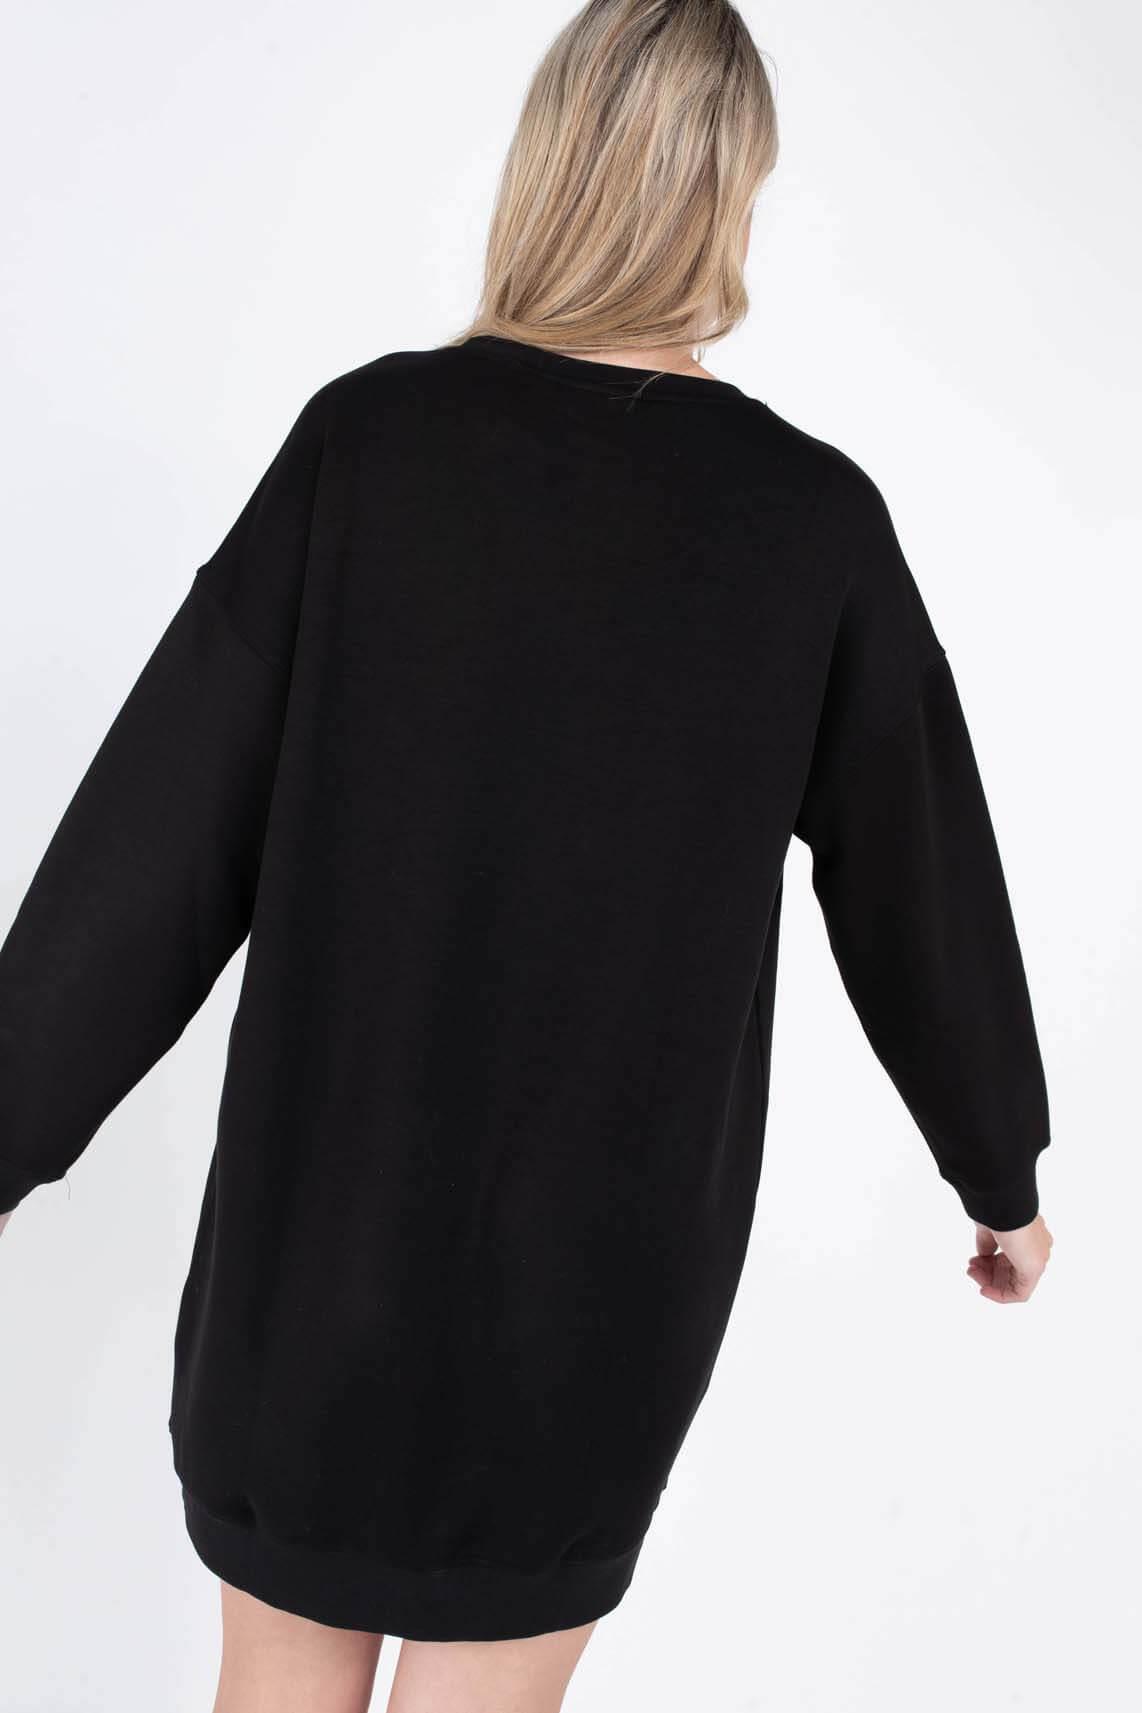 Moss Copenhagen Dames Ima sweatjurk Zwart